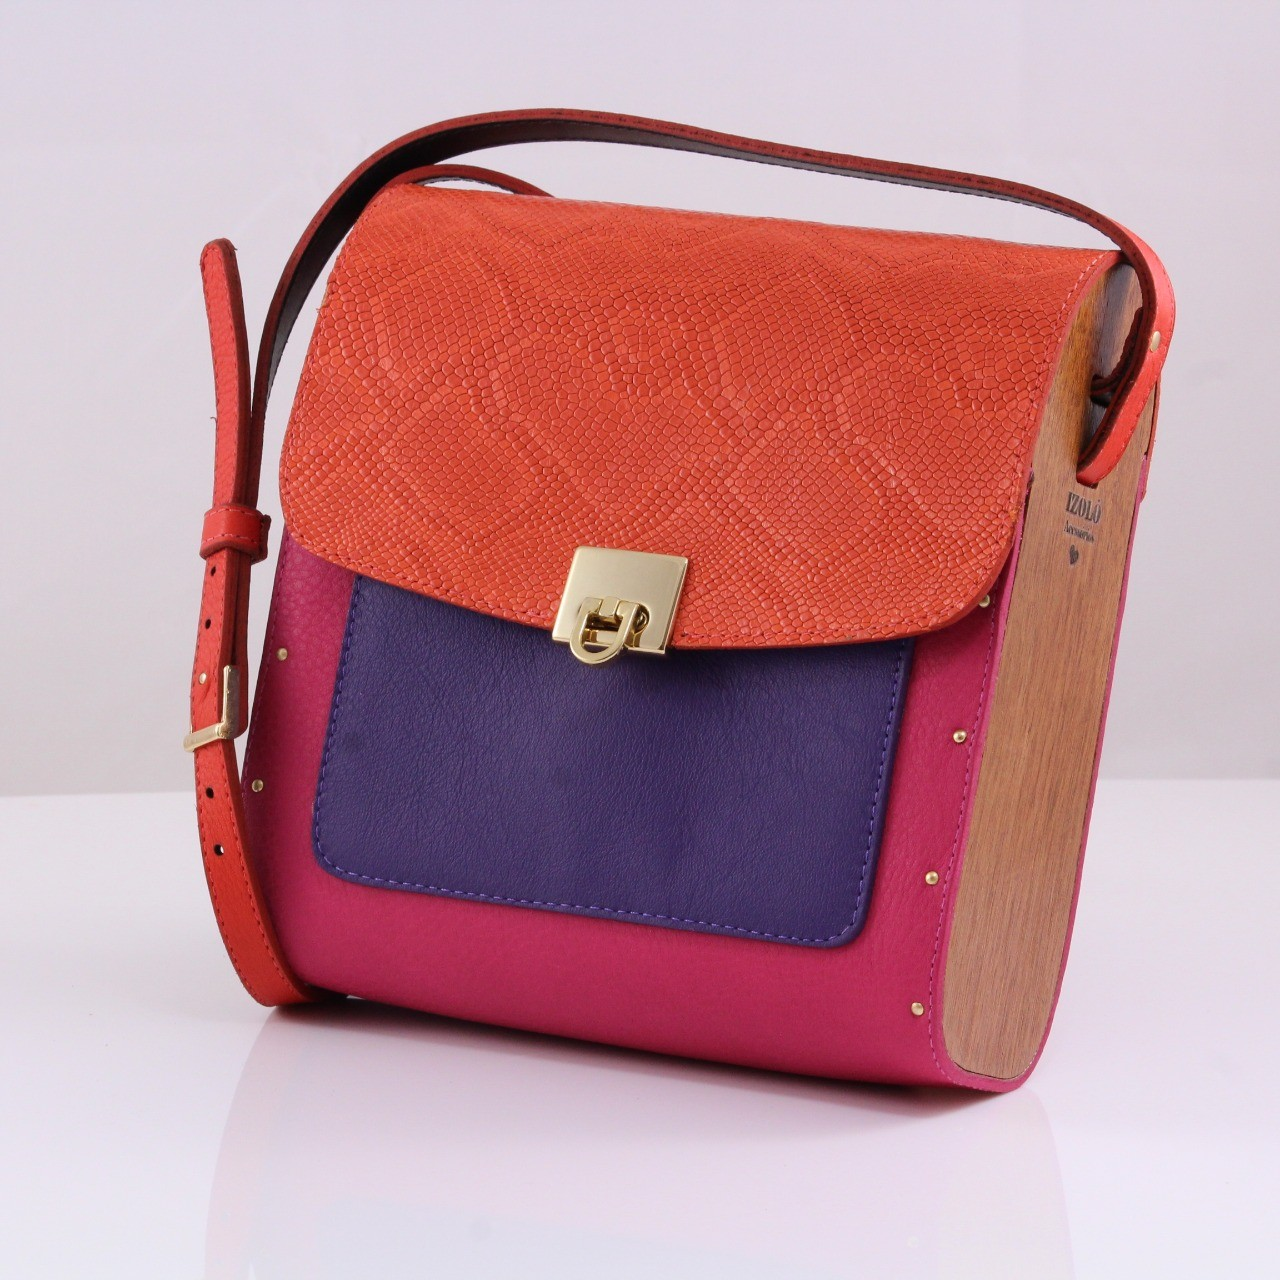 Bolsa Imune Média - Pink, Violeta, Orange